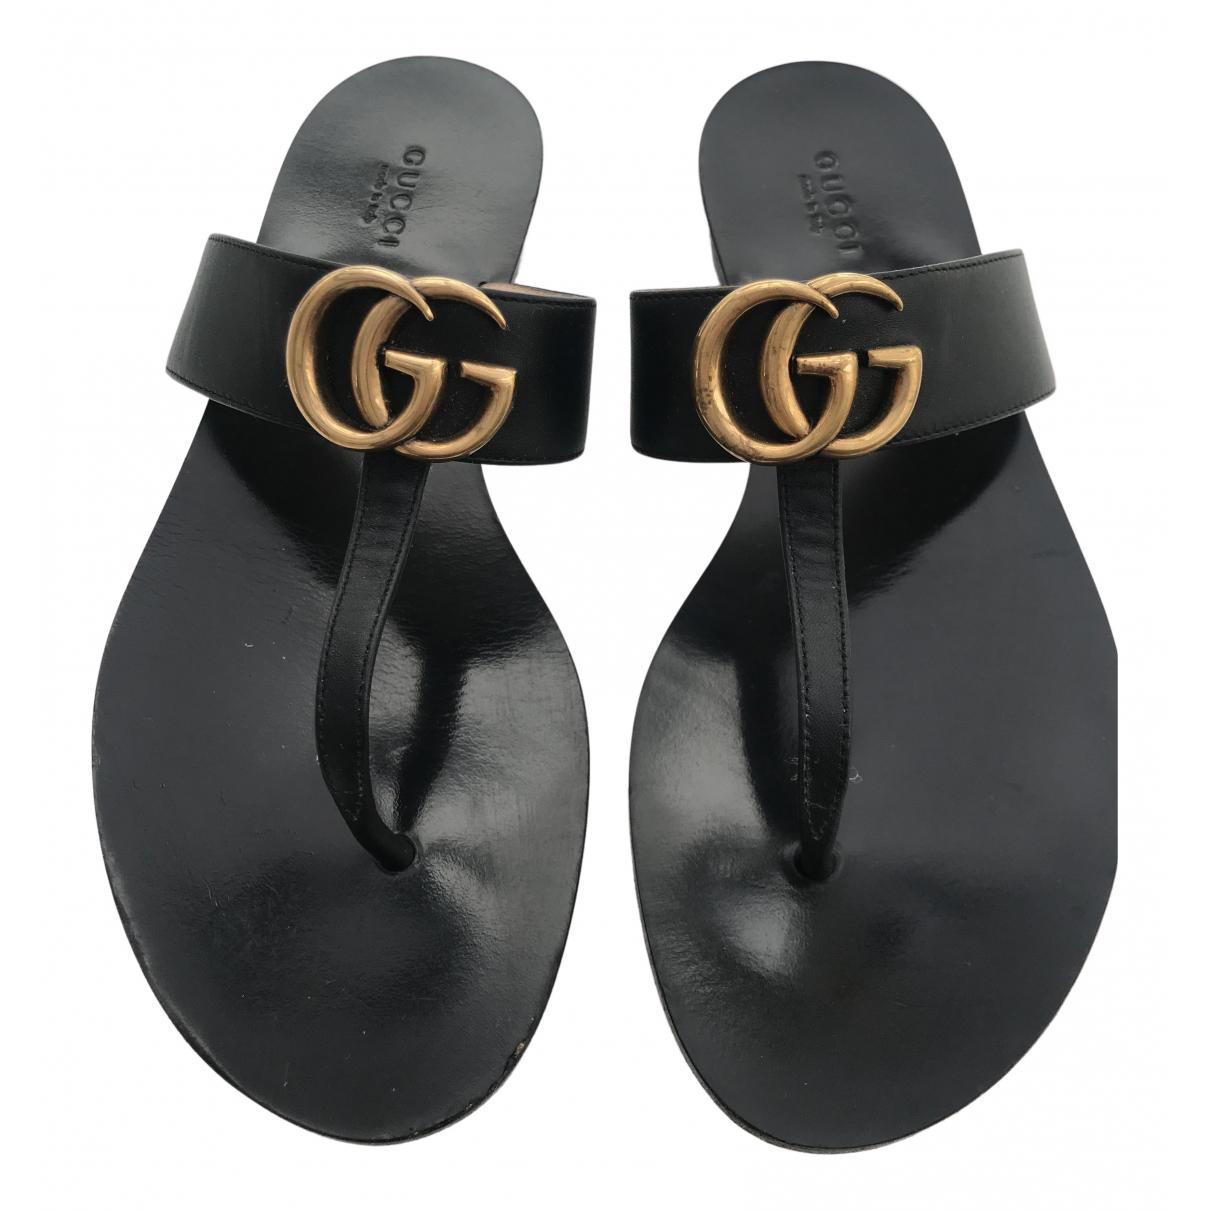 Sandalias romanas Double G de Cuero Gucci